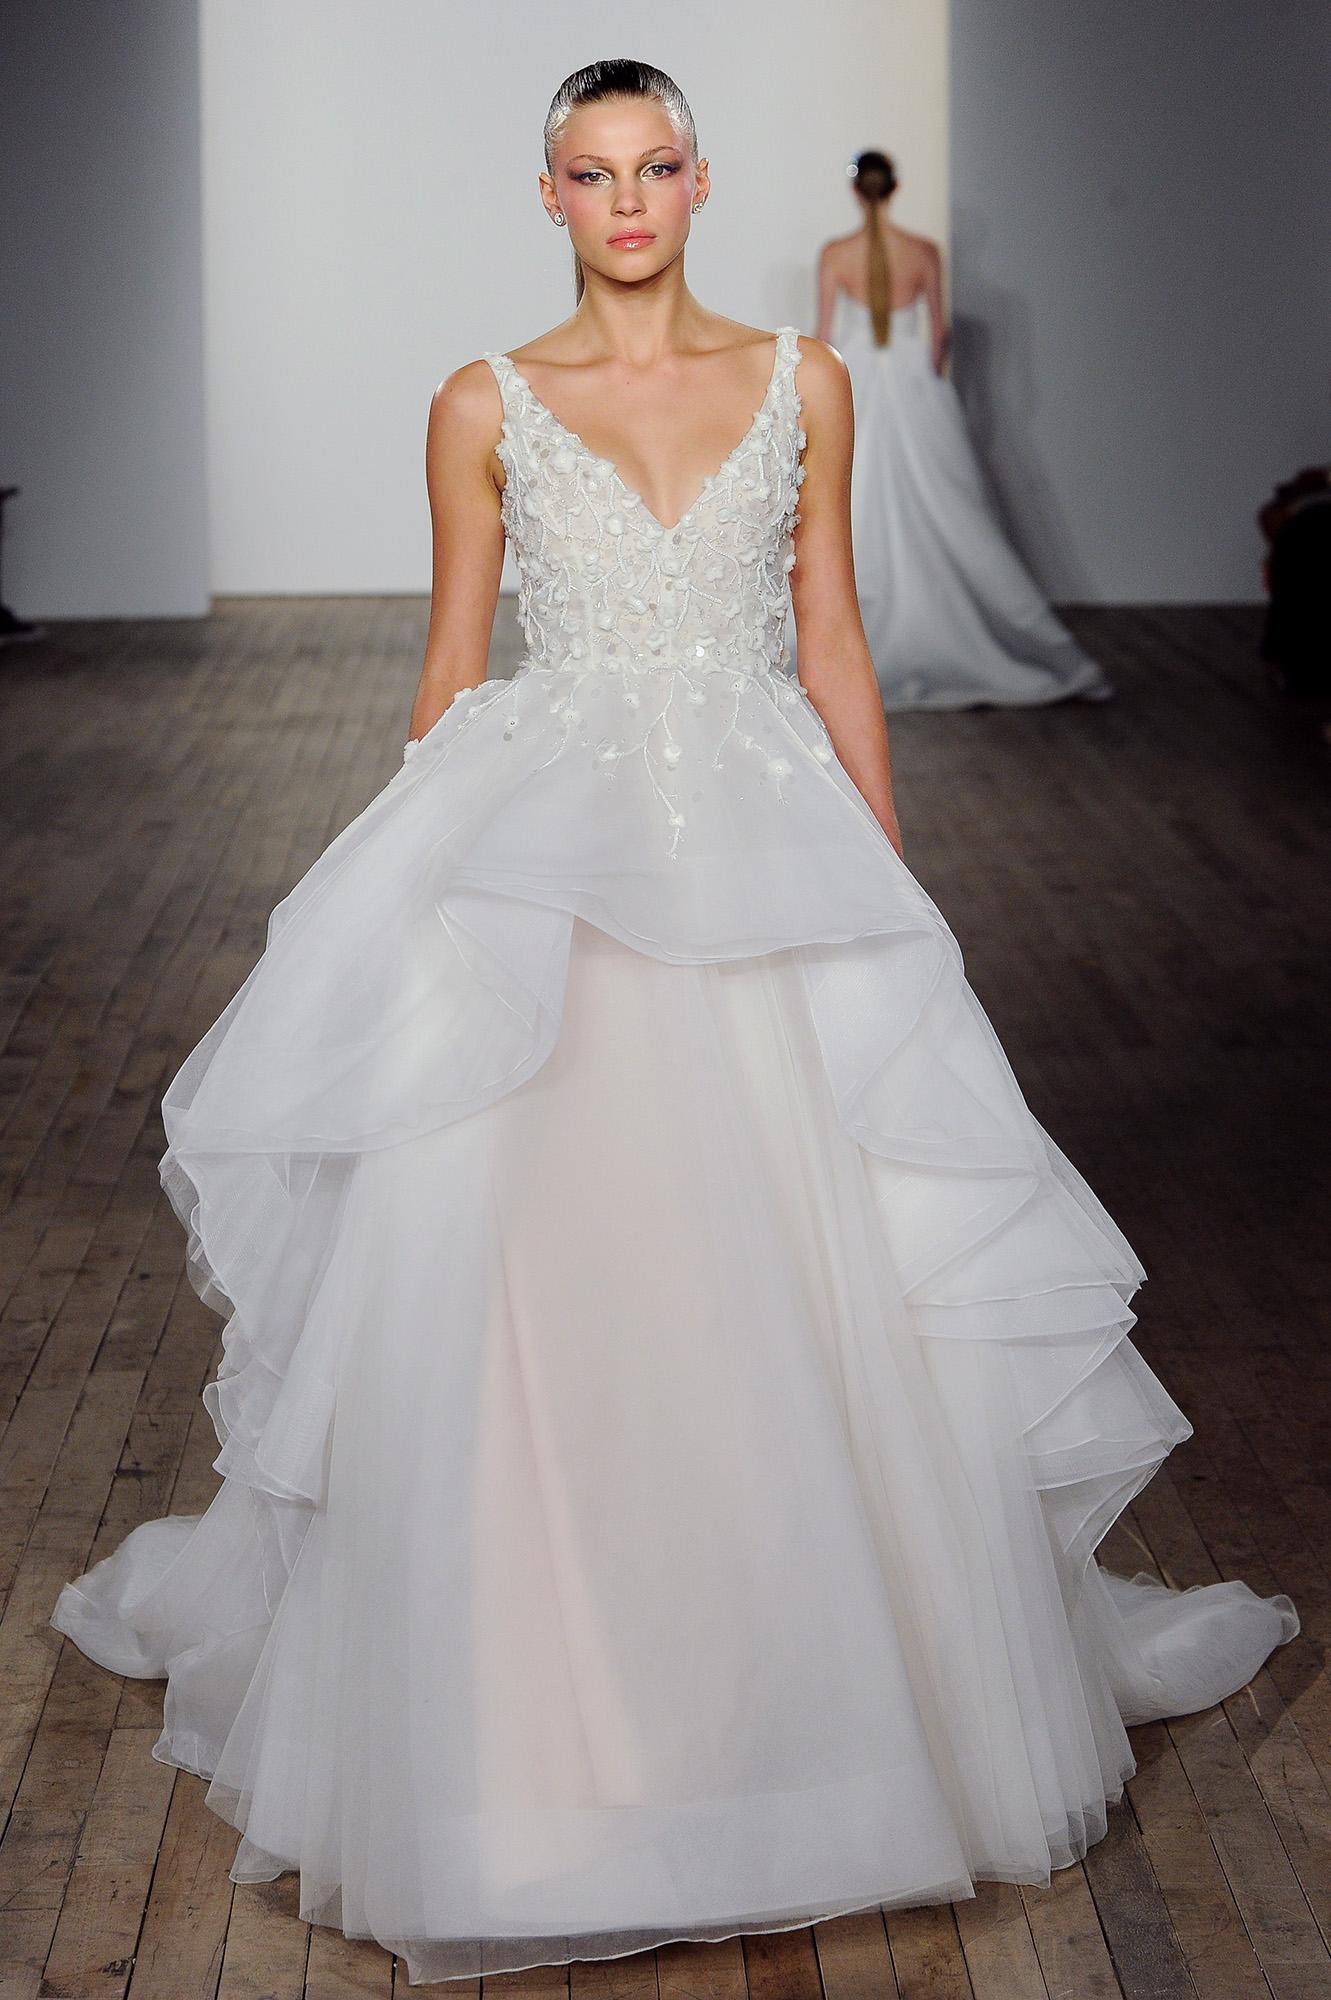 allison webb wedding dress embellished bodice v-neck ruffle high-low over skirt